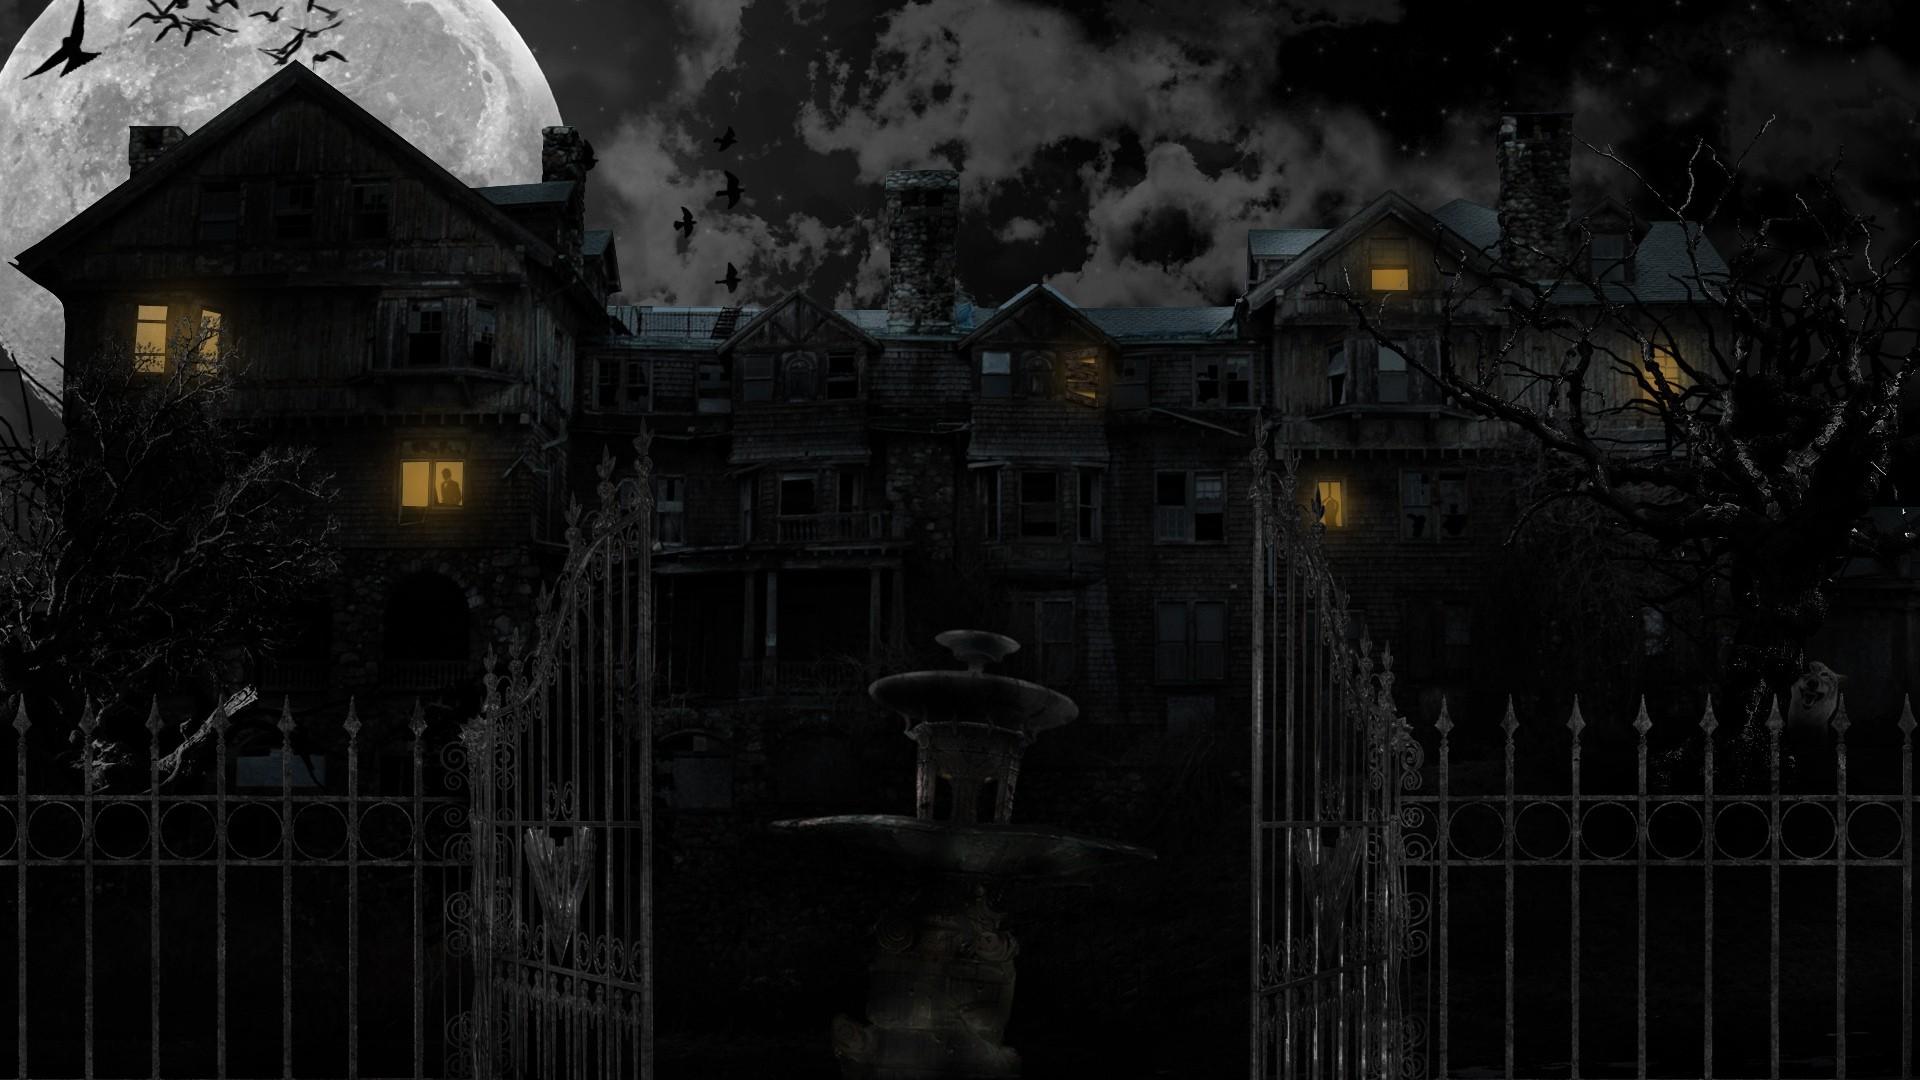 Spooky Background Wallpaper